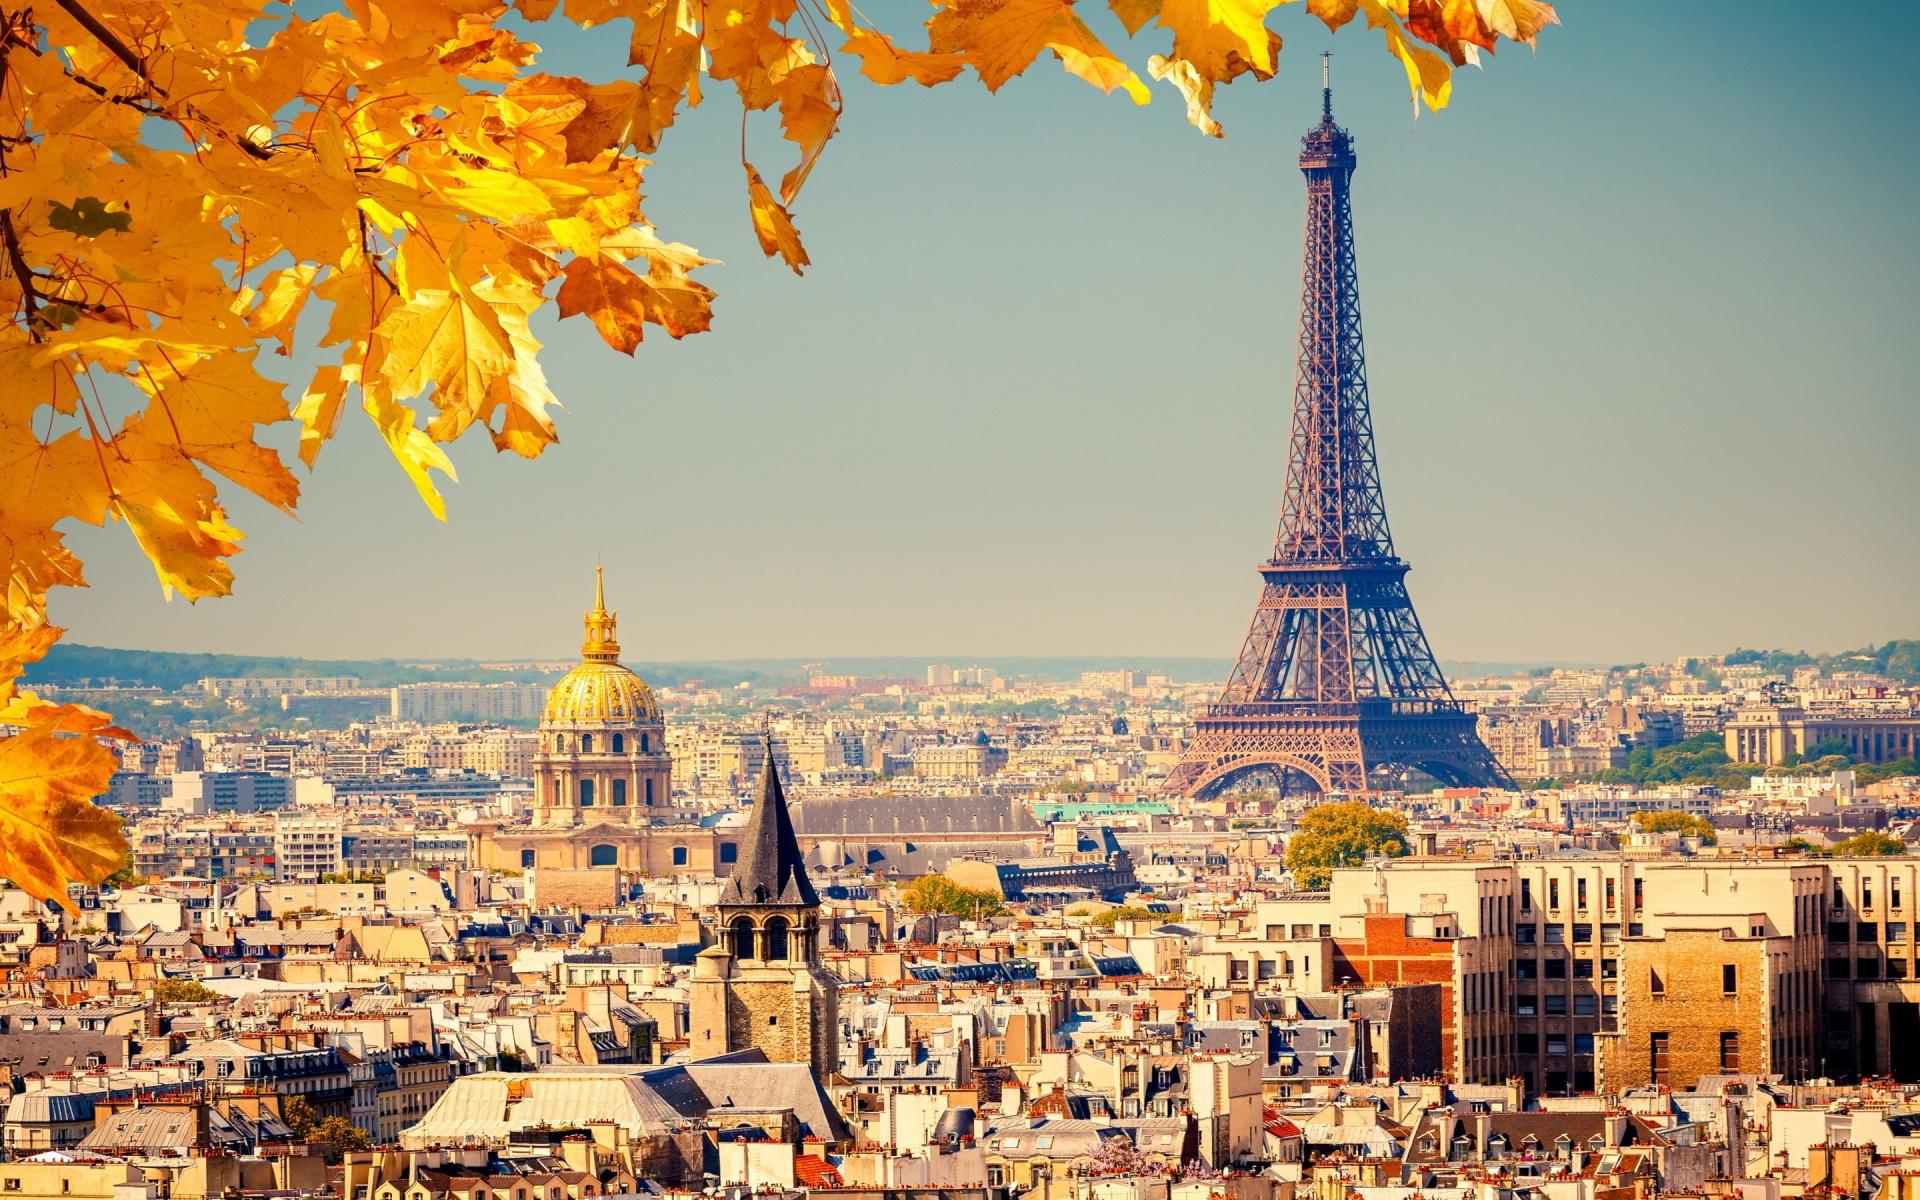 Paris Eiffel Tower Tumblr Wallpaper Wallpaper WallpaperLepi 1920x1200